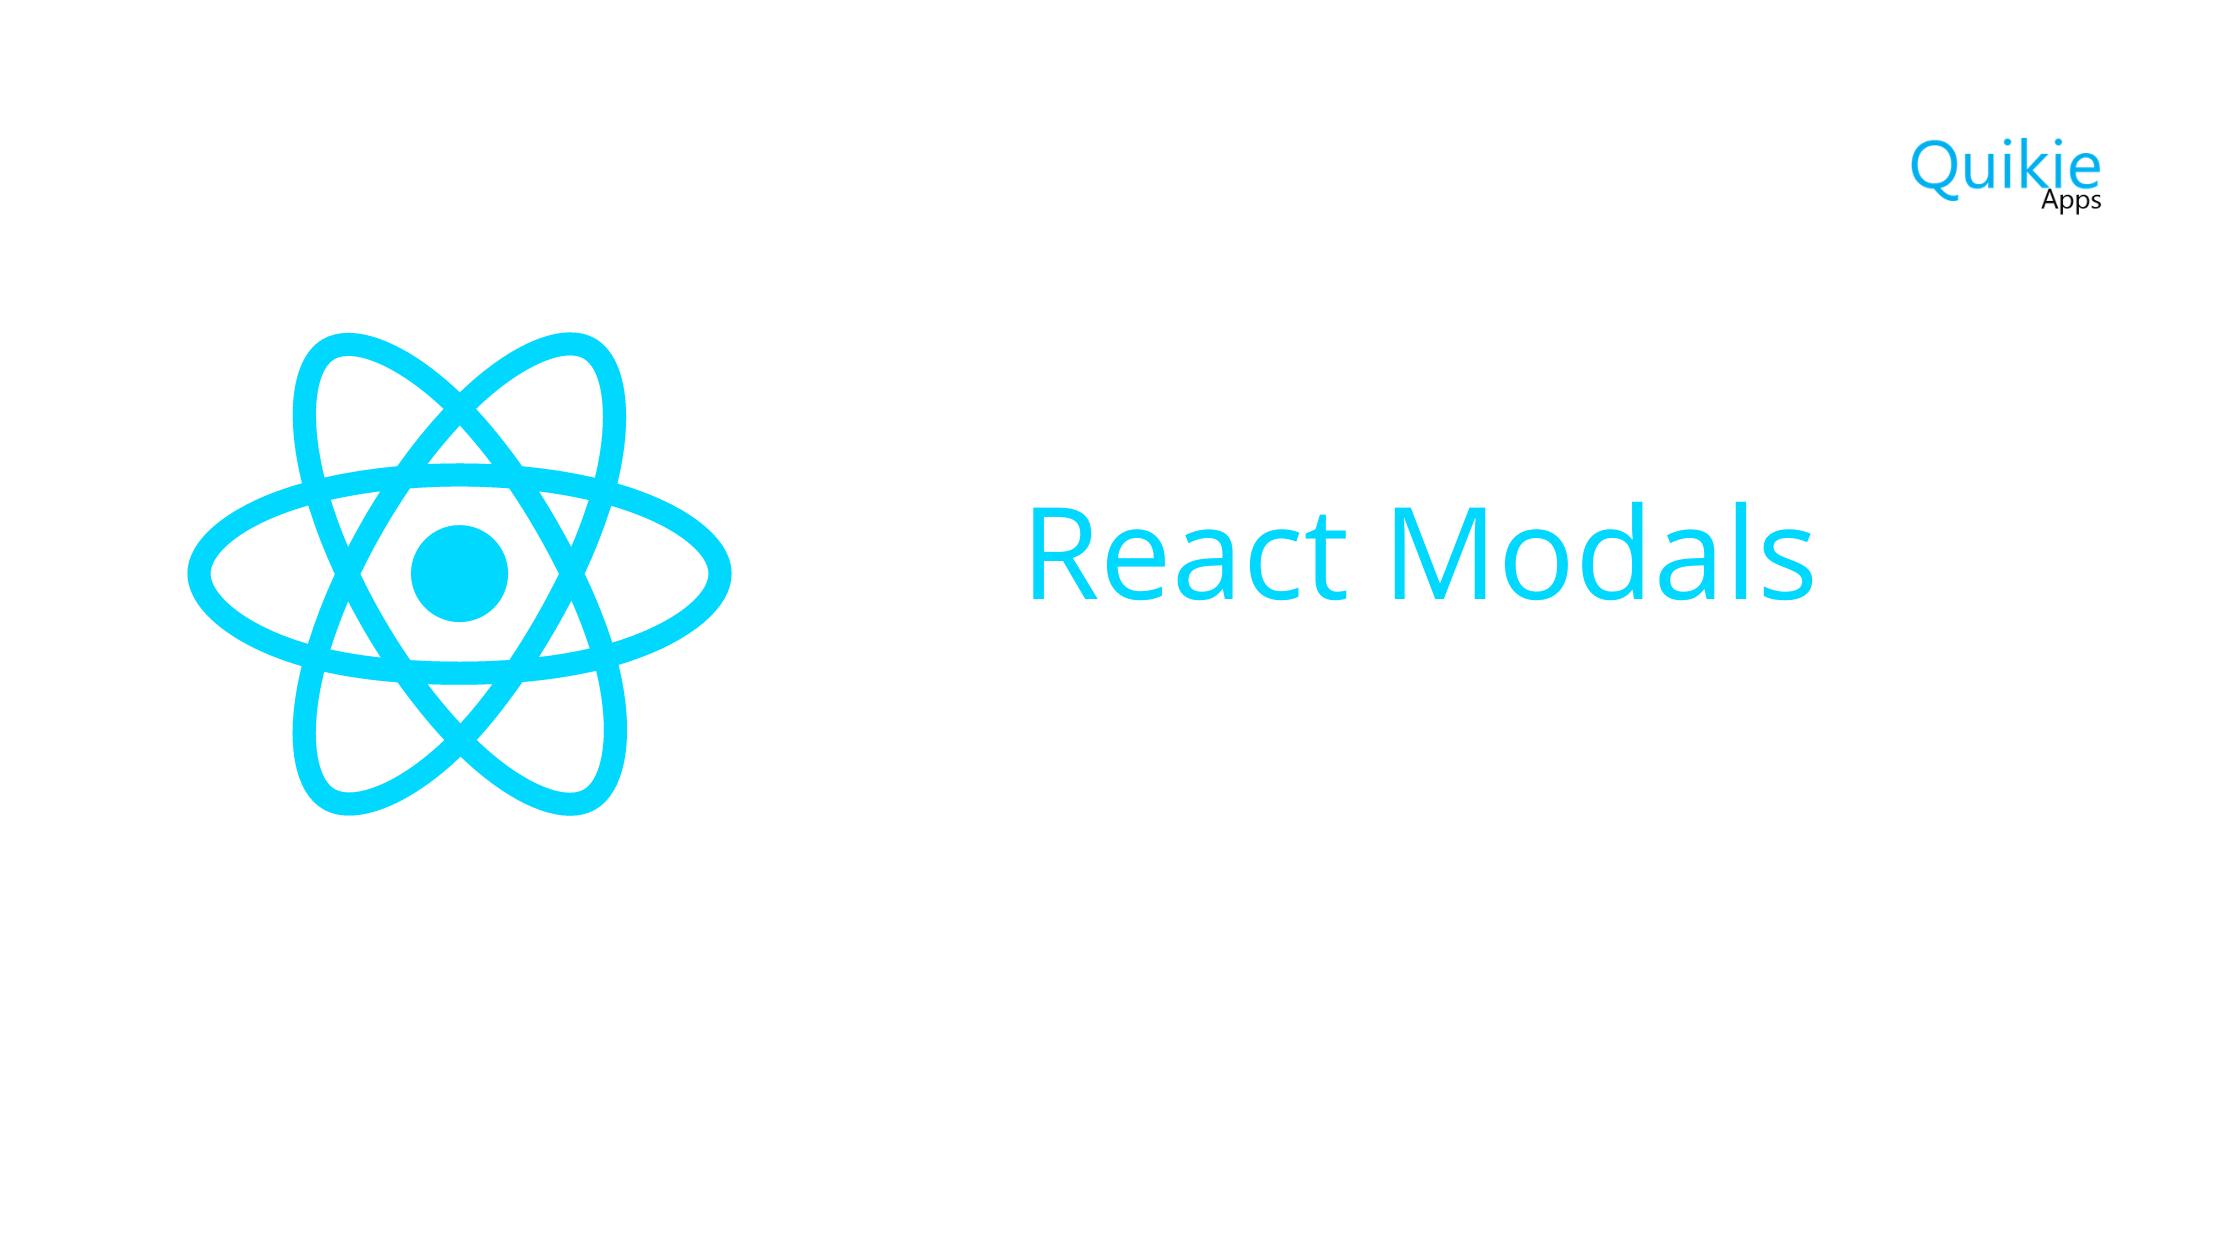 React Modals